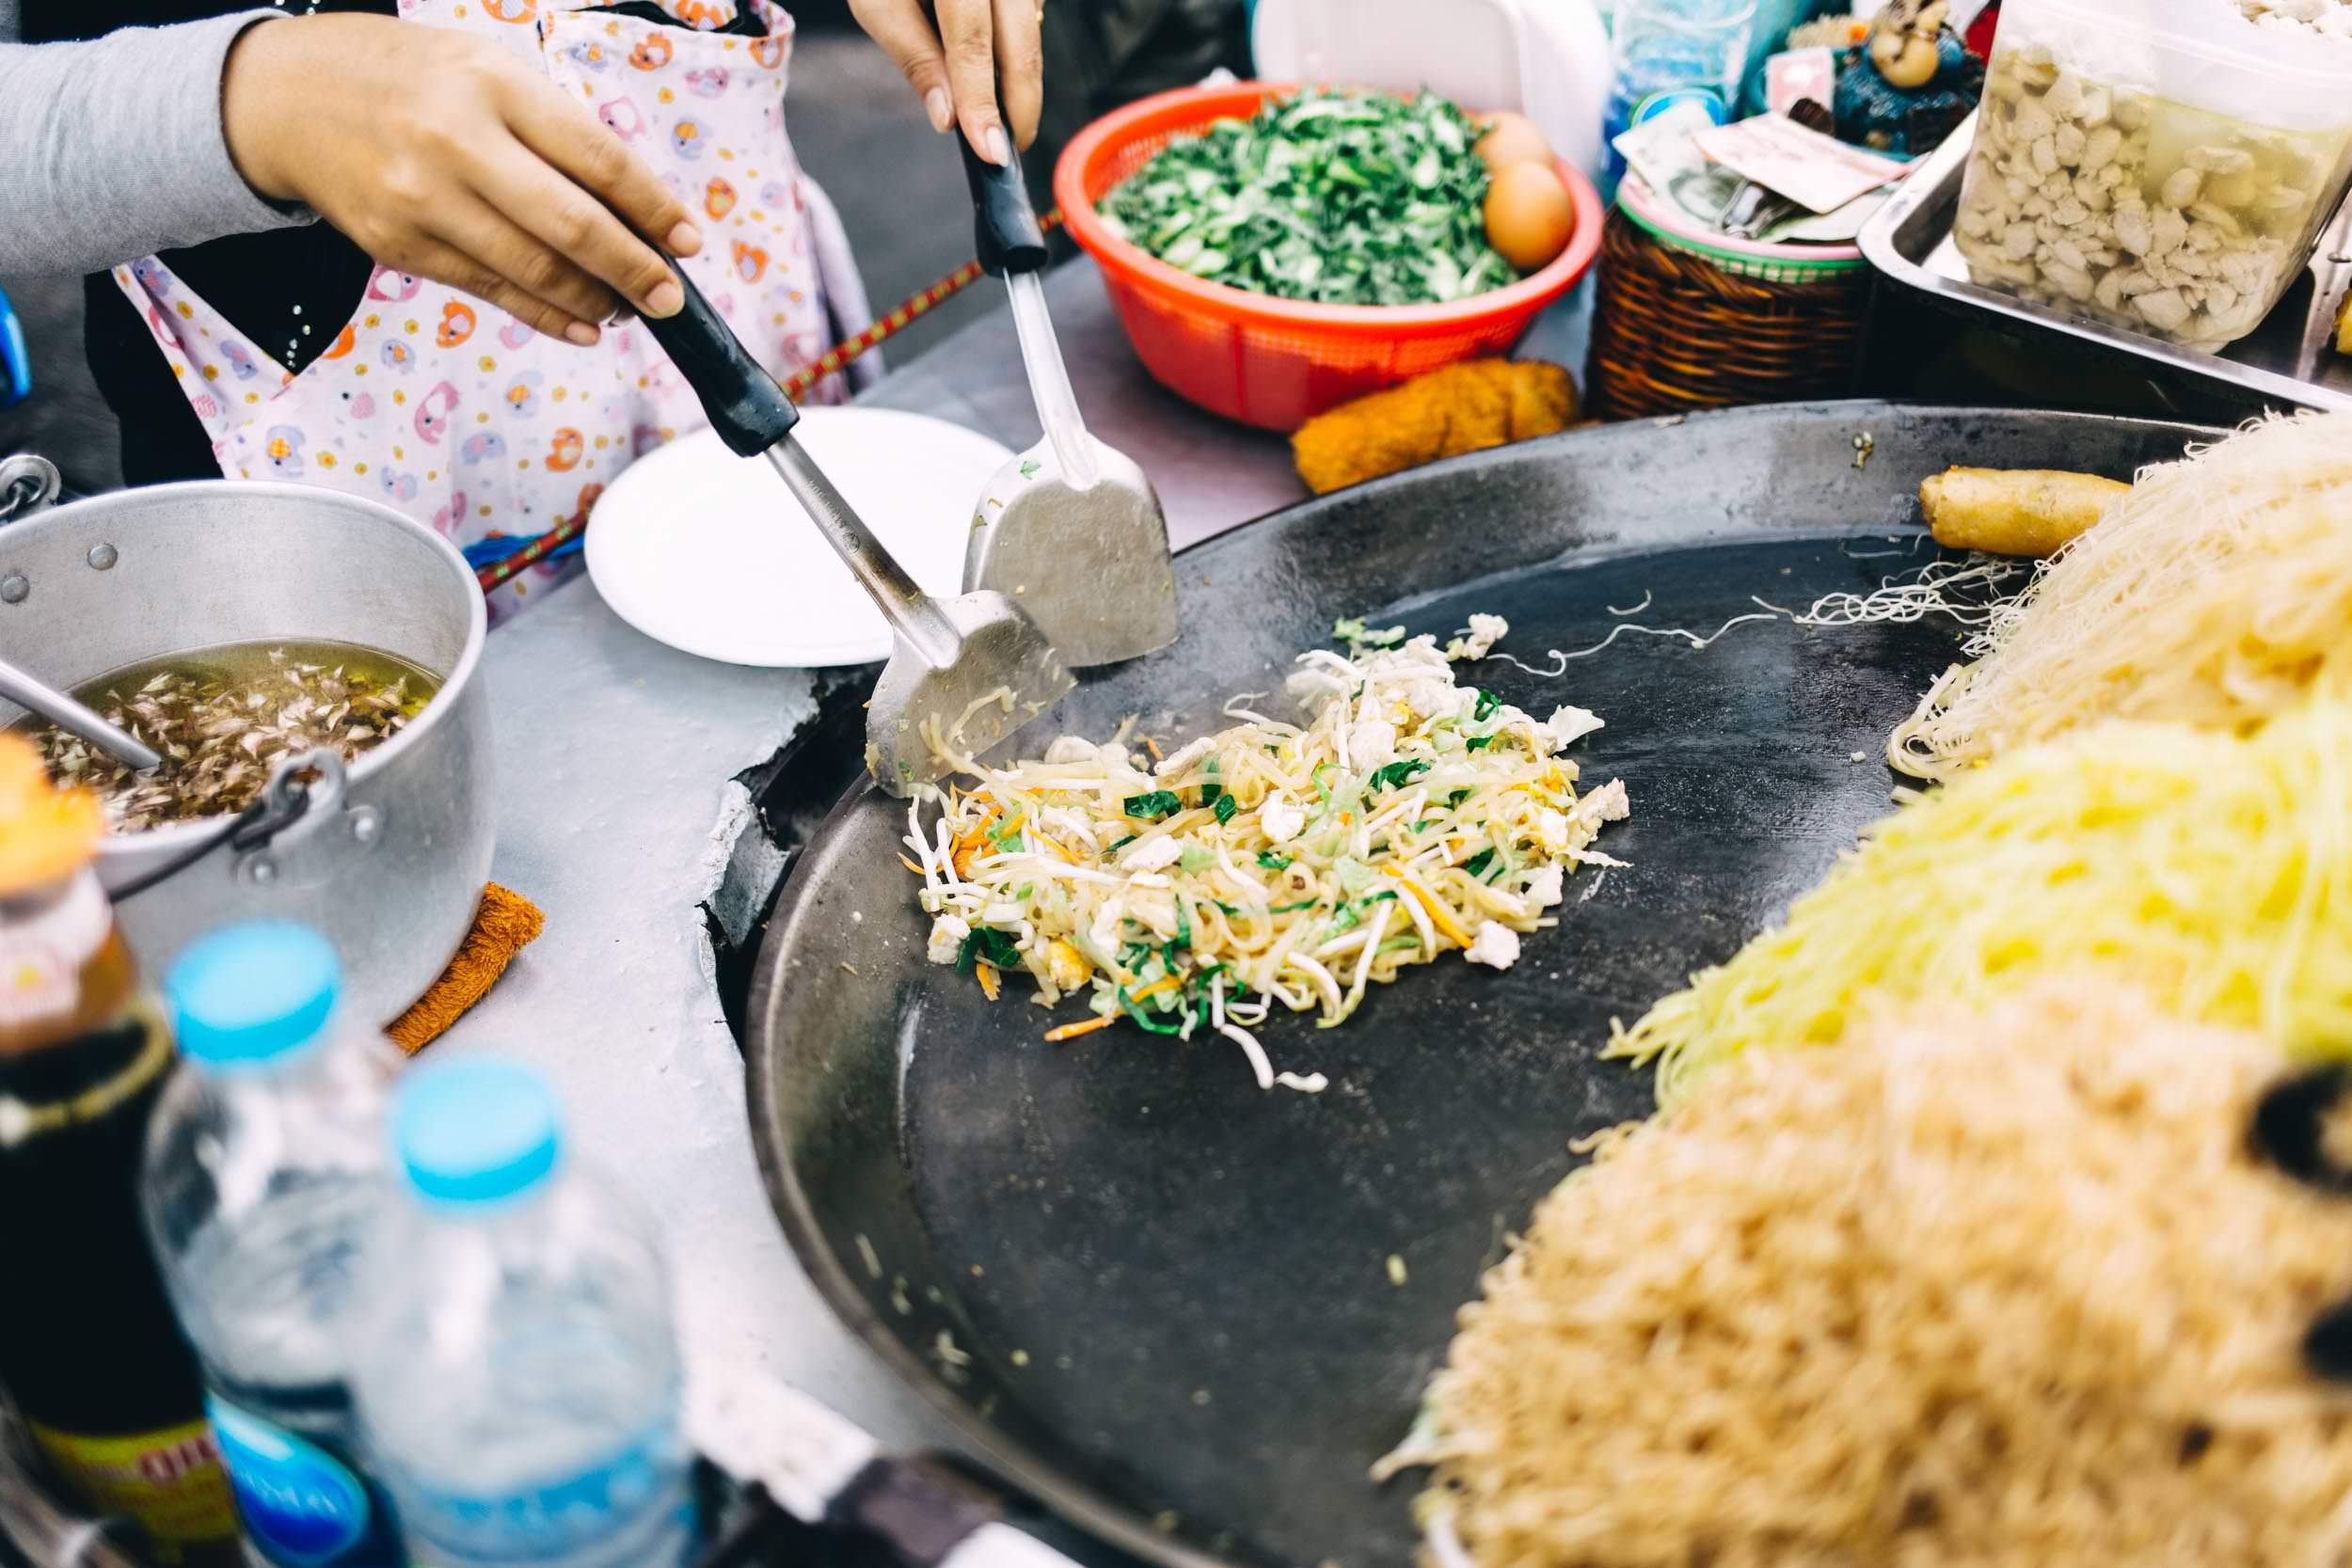 thailand_budget_travel_011.jpg